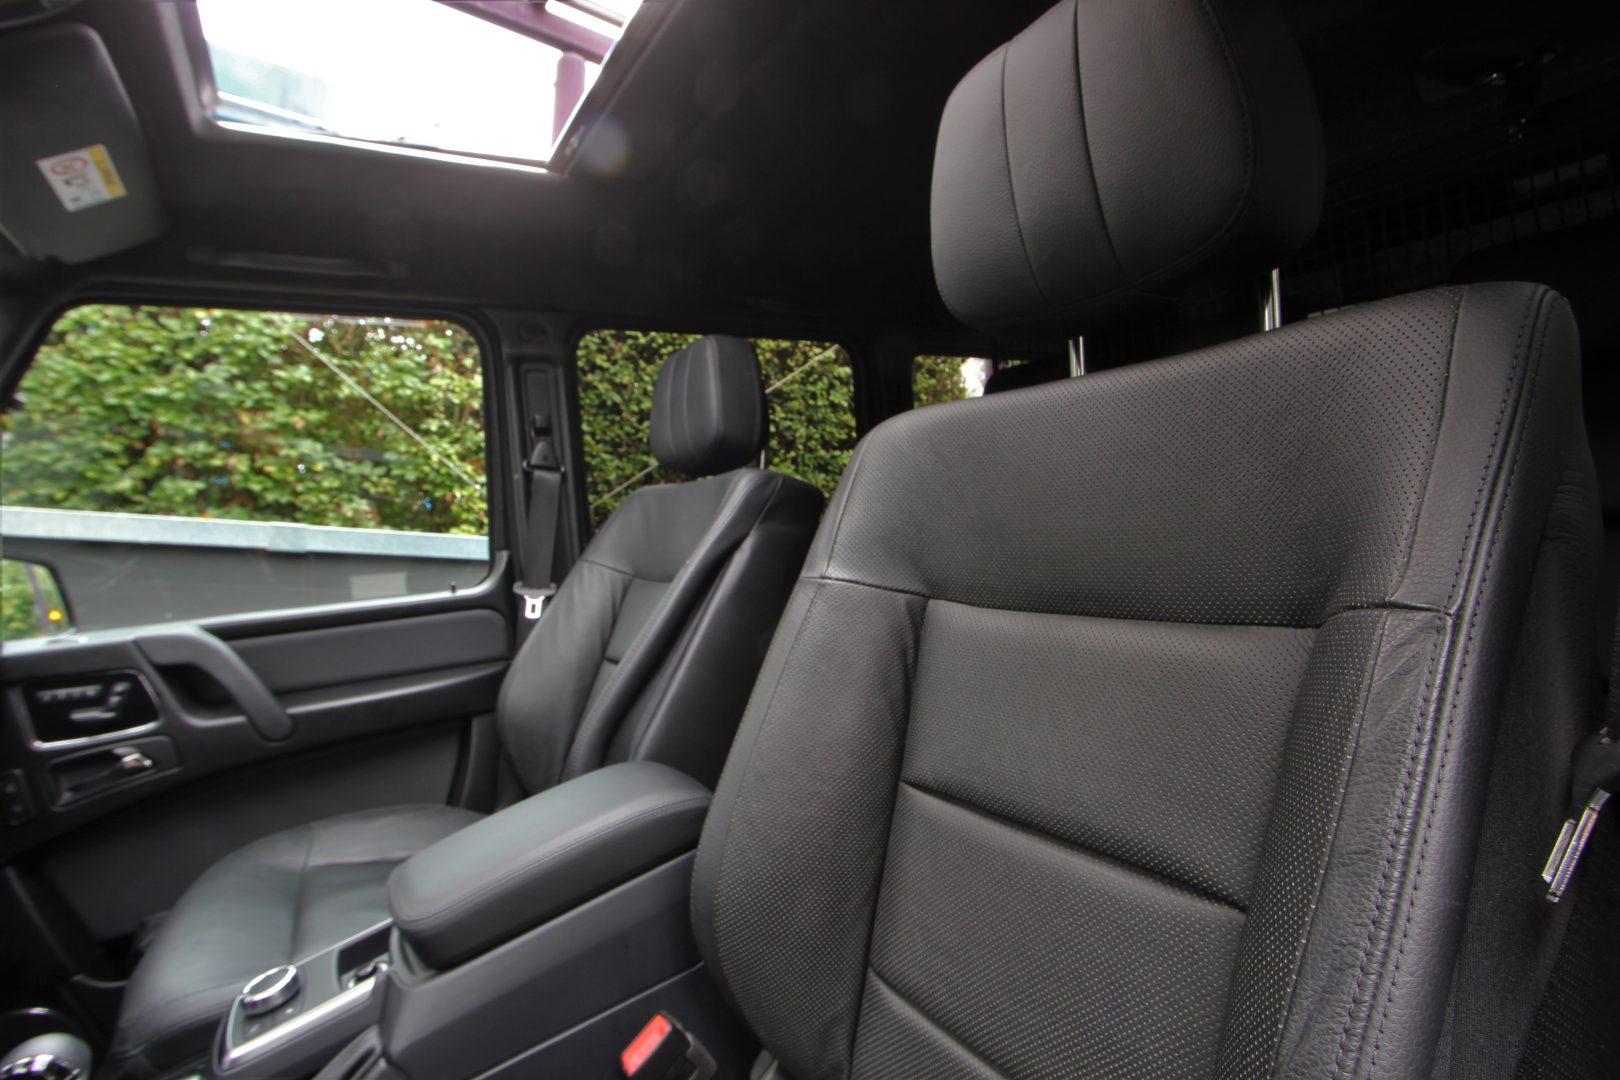 AIL Mercedes-Benz G 500 V8 Harman-Kardon Exklusiv Paket DAB 9